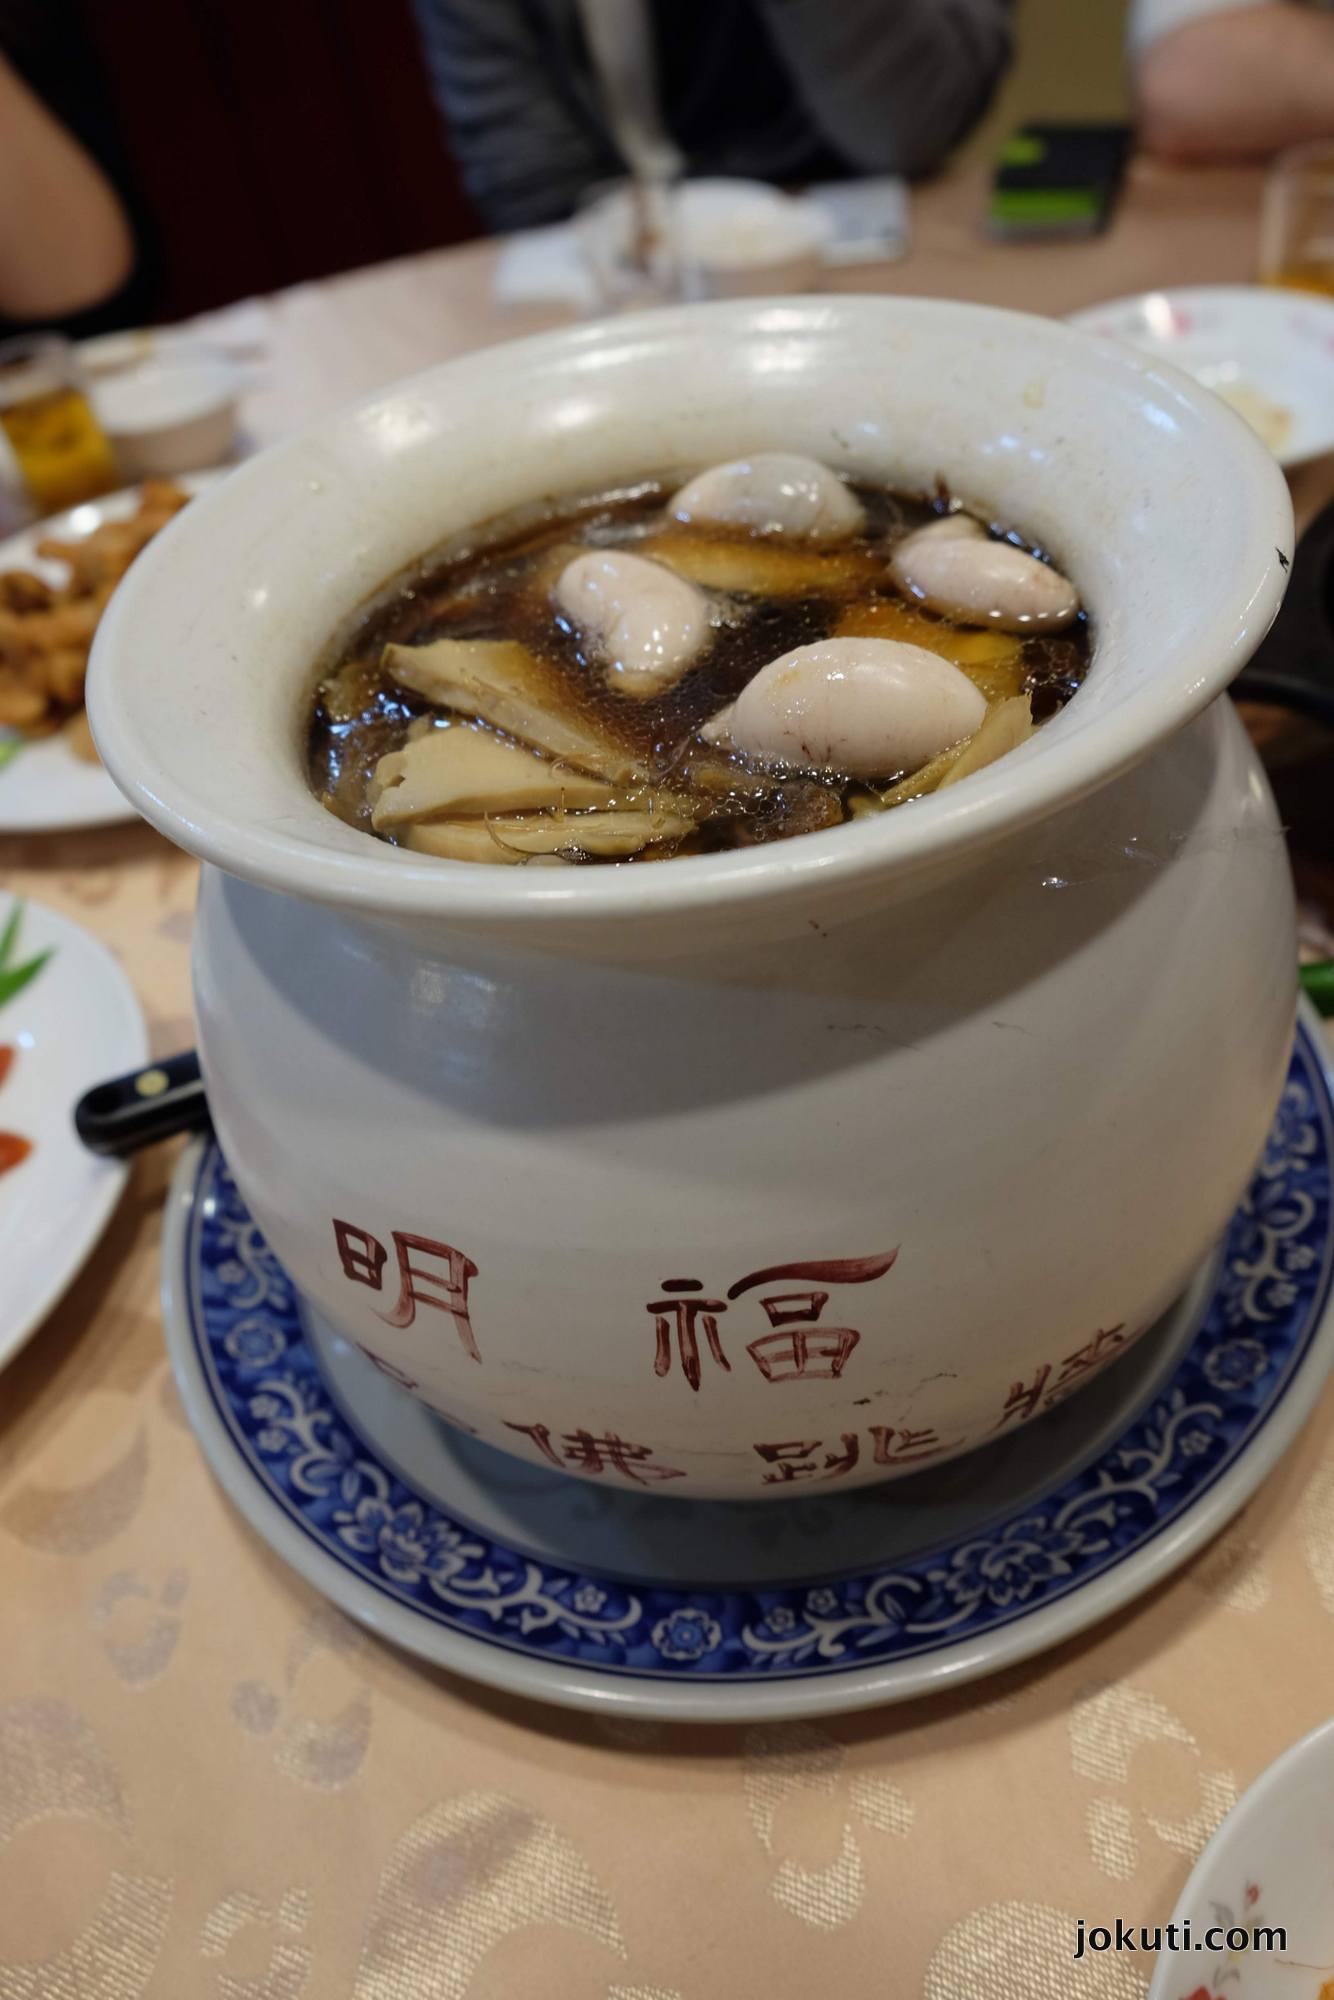 dscf2957_taipei_ming_fu_seafood_michelin_taiwan_vilagevo_jokuti.jpg